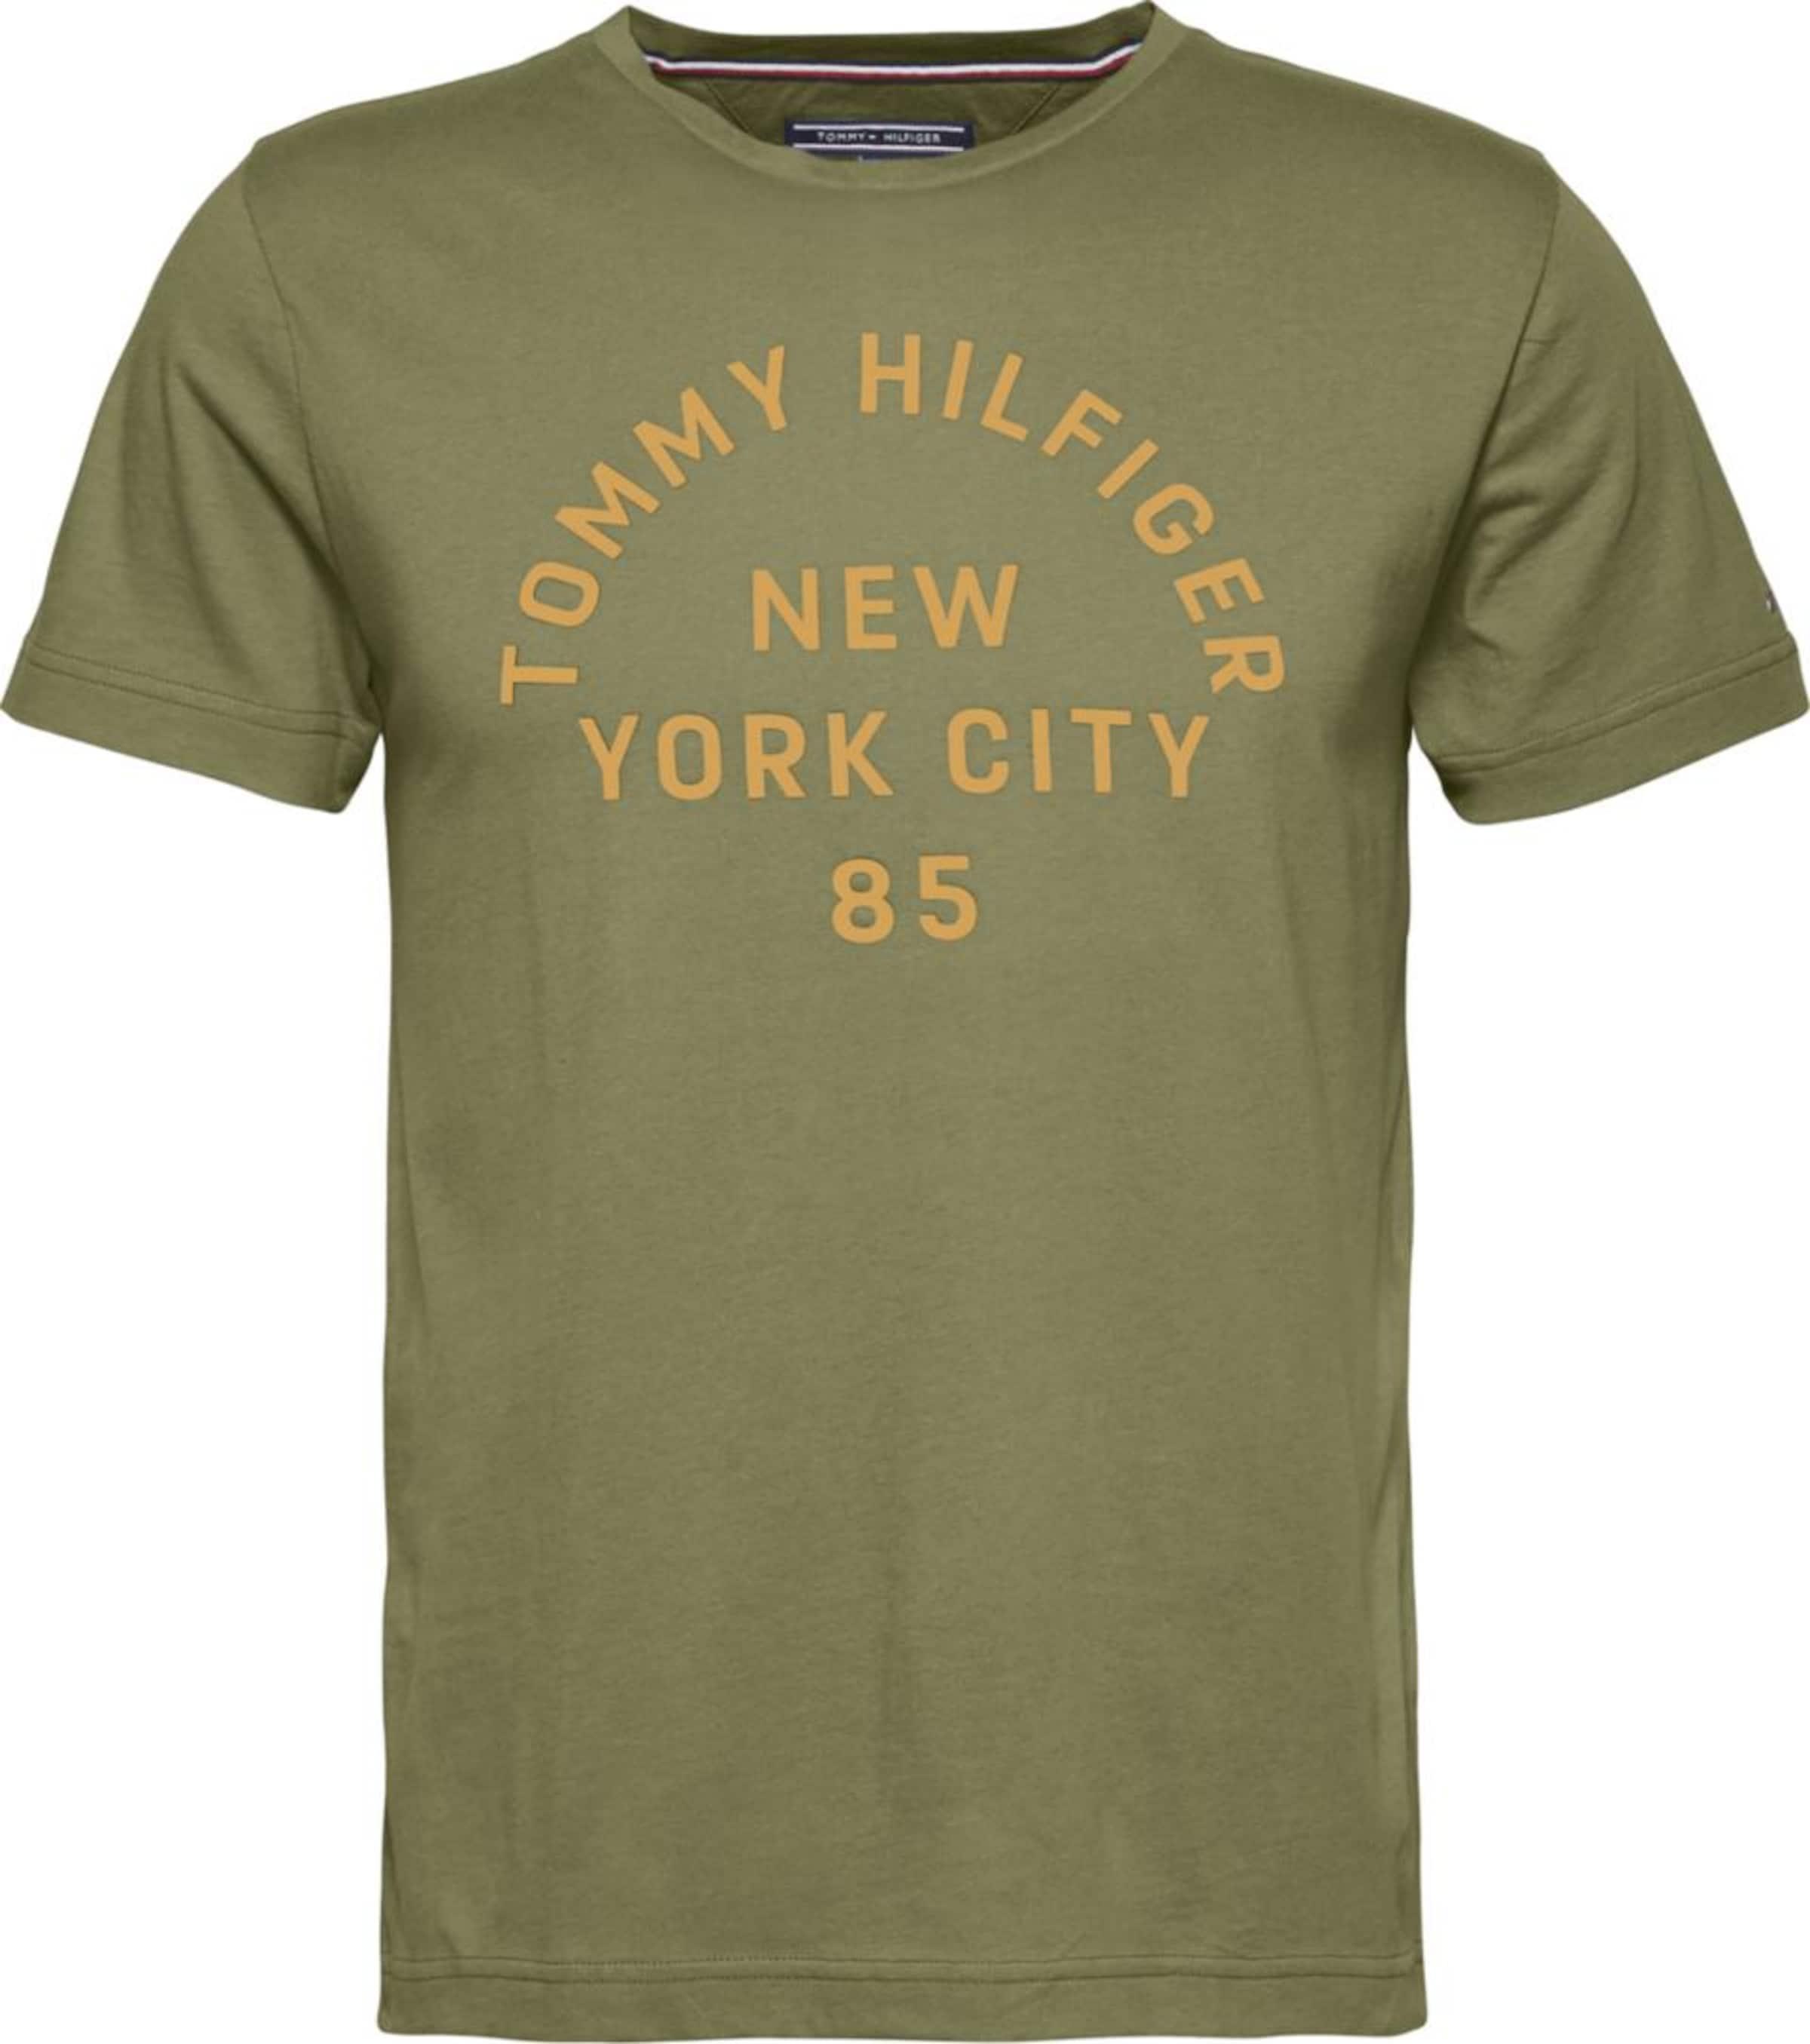 TOMMY HILFIGER T-Shirt 'Four Leaf Clover' Billige Offizielle Seite Grau-Outlet-Store Online Vdy0D